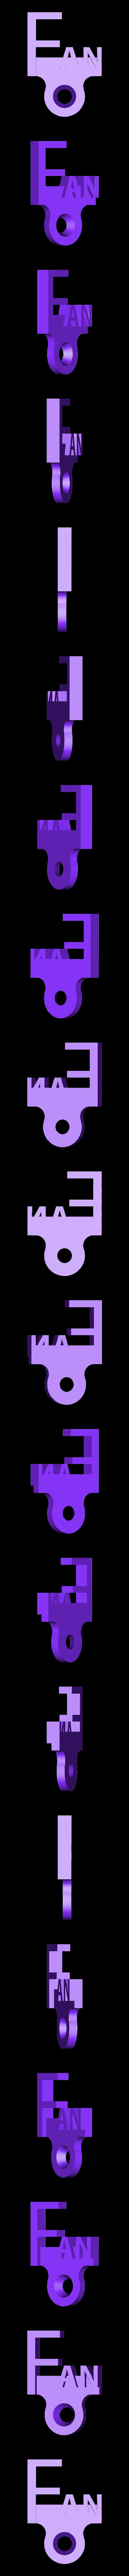 Fan.stl Download free STL file Tag for switch plate #1 • 3D print object, WallTosh